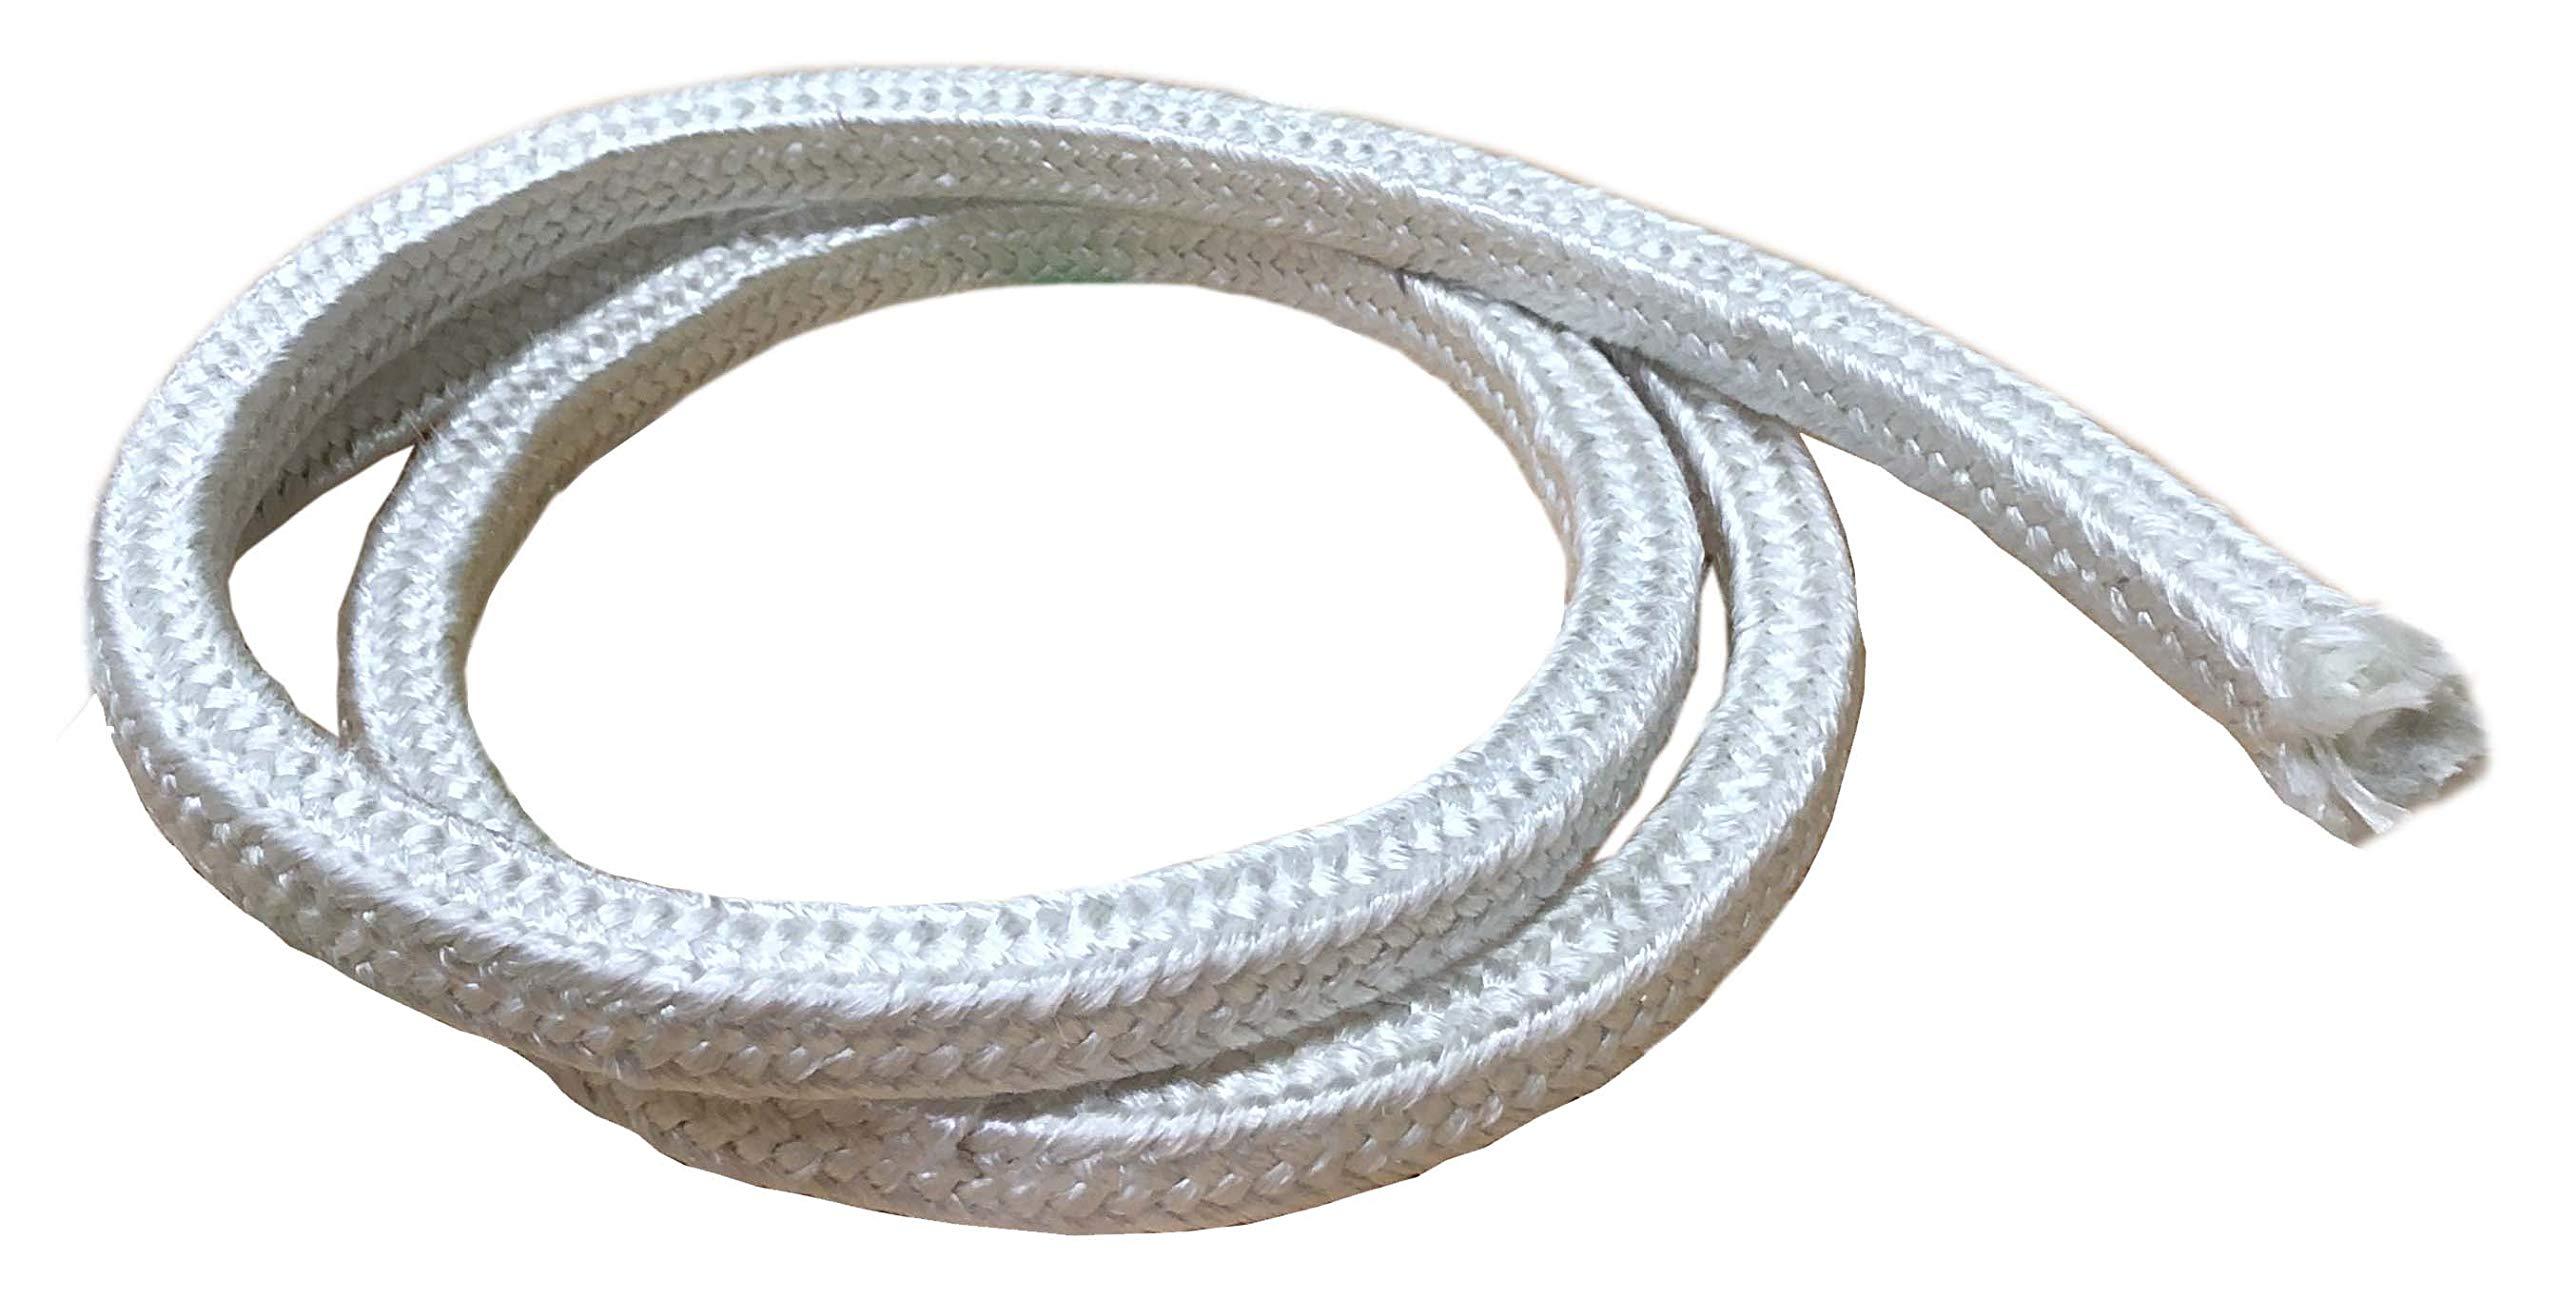 MinGlas Rope Seal - Fiberglass Square Braided Rope Gasket 1'' x 25 feet, Firm High-Density, Stove Boiler Furnace Oven Kiln Door Seal Gasket